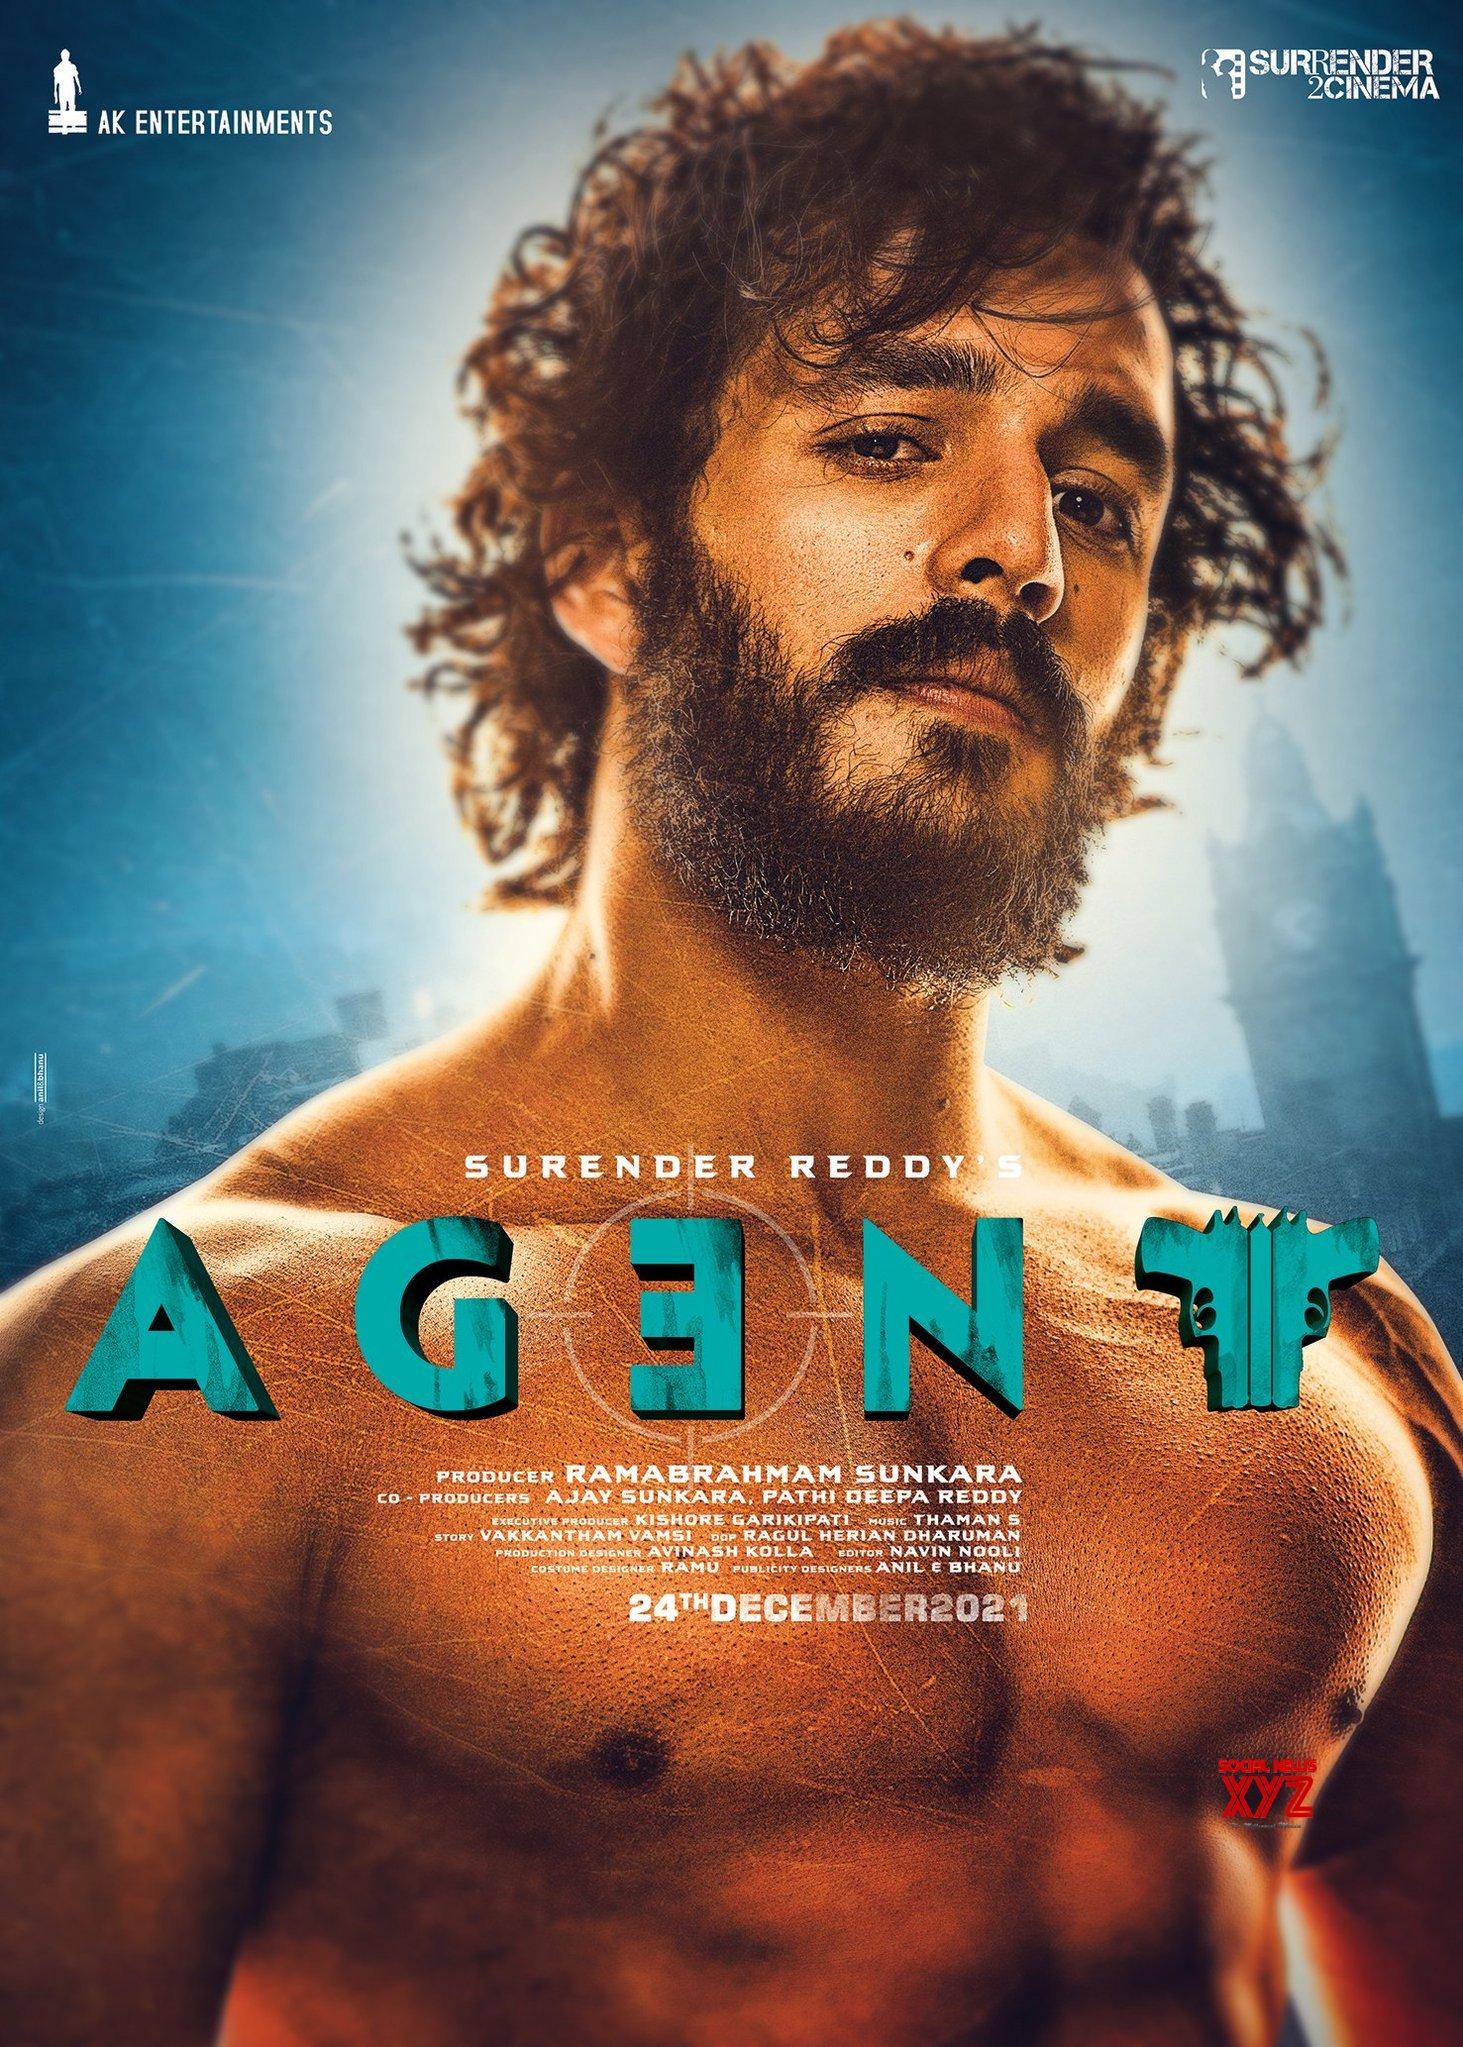 Akhil Akkineni's Stunning 6 Pack Look From Agent Movie